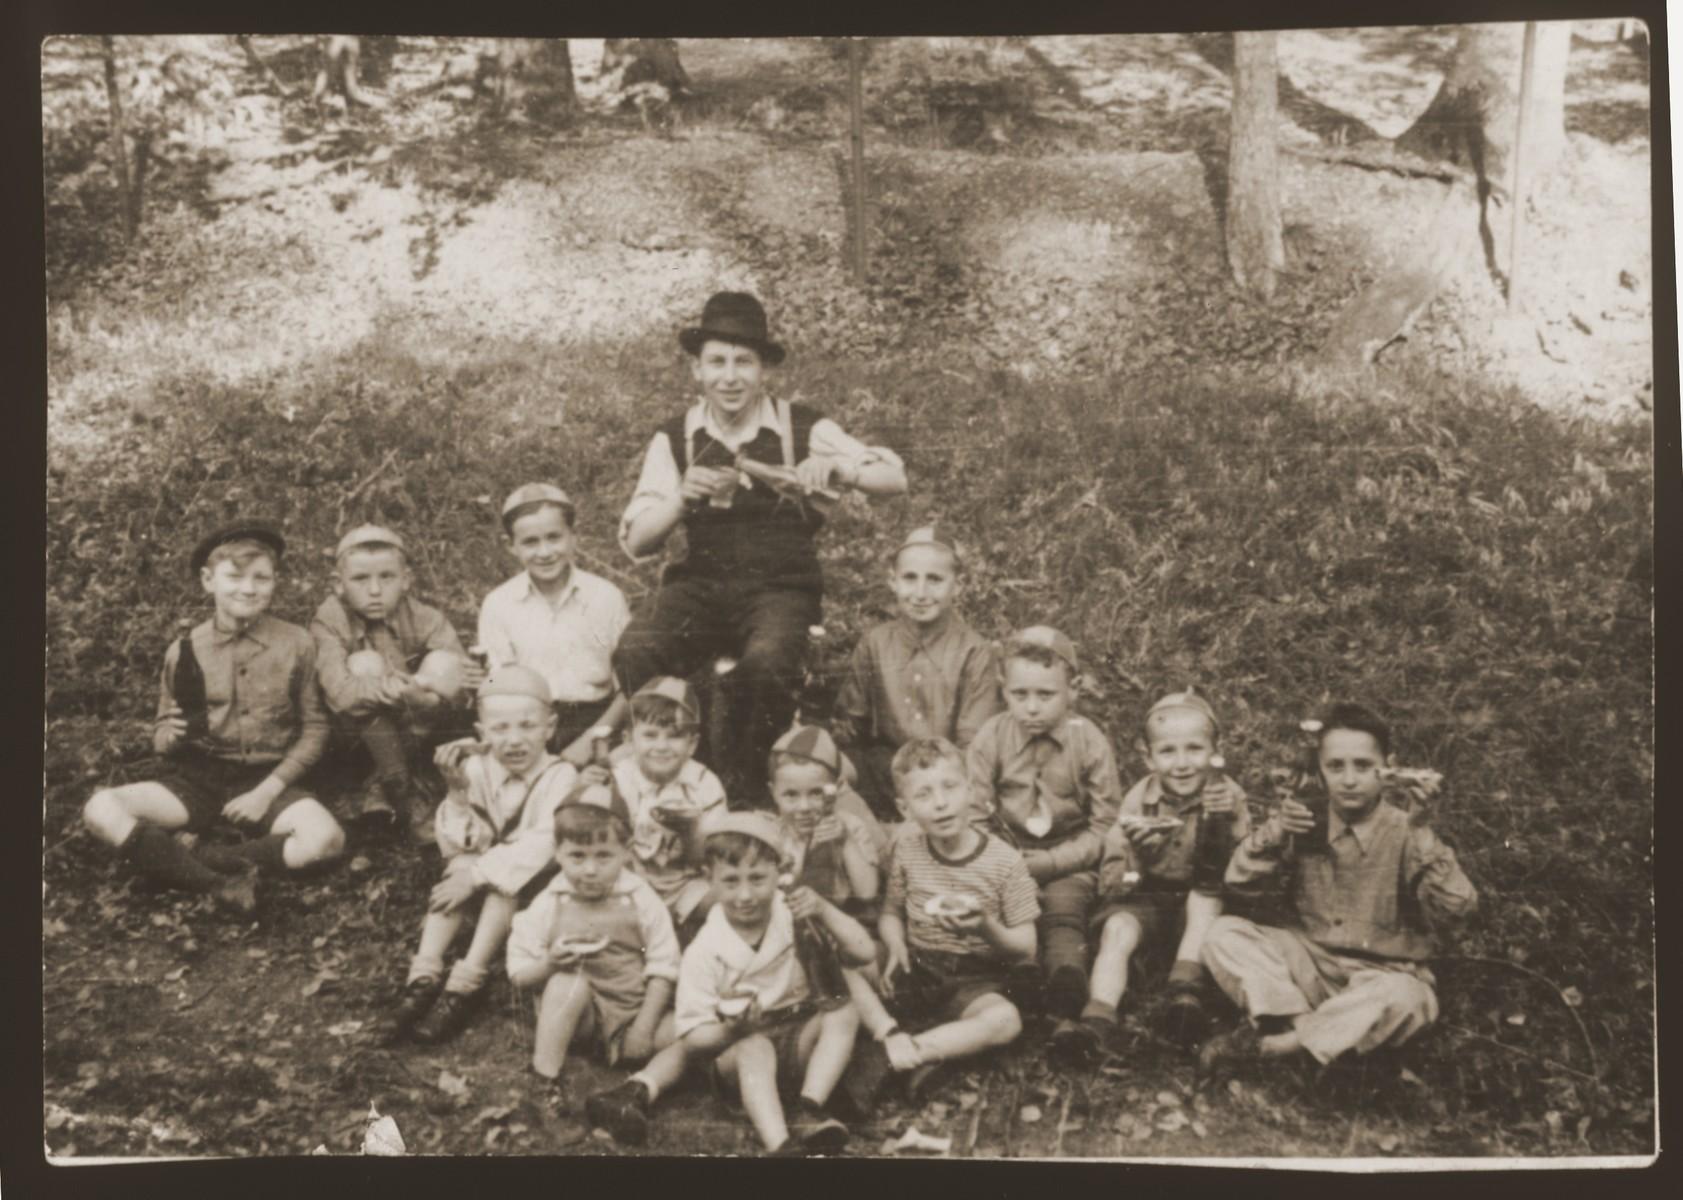 A teacher poses with his students from a Feldafing cheder on a picnic excursion.   The teacher is Meir Katz.  The children are Yaakov Stetsky, Alter Rothbart, Aaron Cukerman, Avrohom Strikovsky, Avrohom Rosenberg, Moshe Bertram. Meir Hose, Victor Schultz, Chaim Birnbaum, Wolf Strasberg, Chaim Frashkir, Leibe Bzshisky, and Mottel Sobolsky.